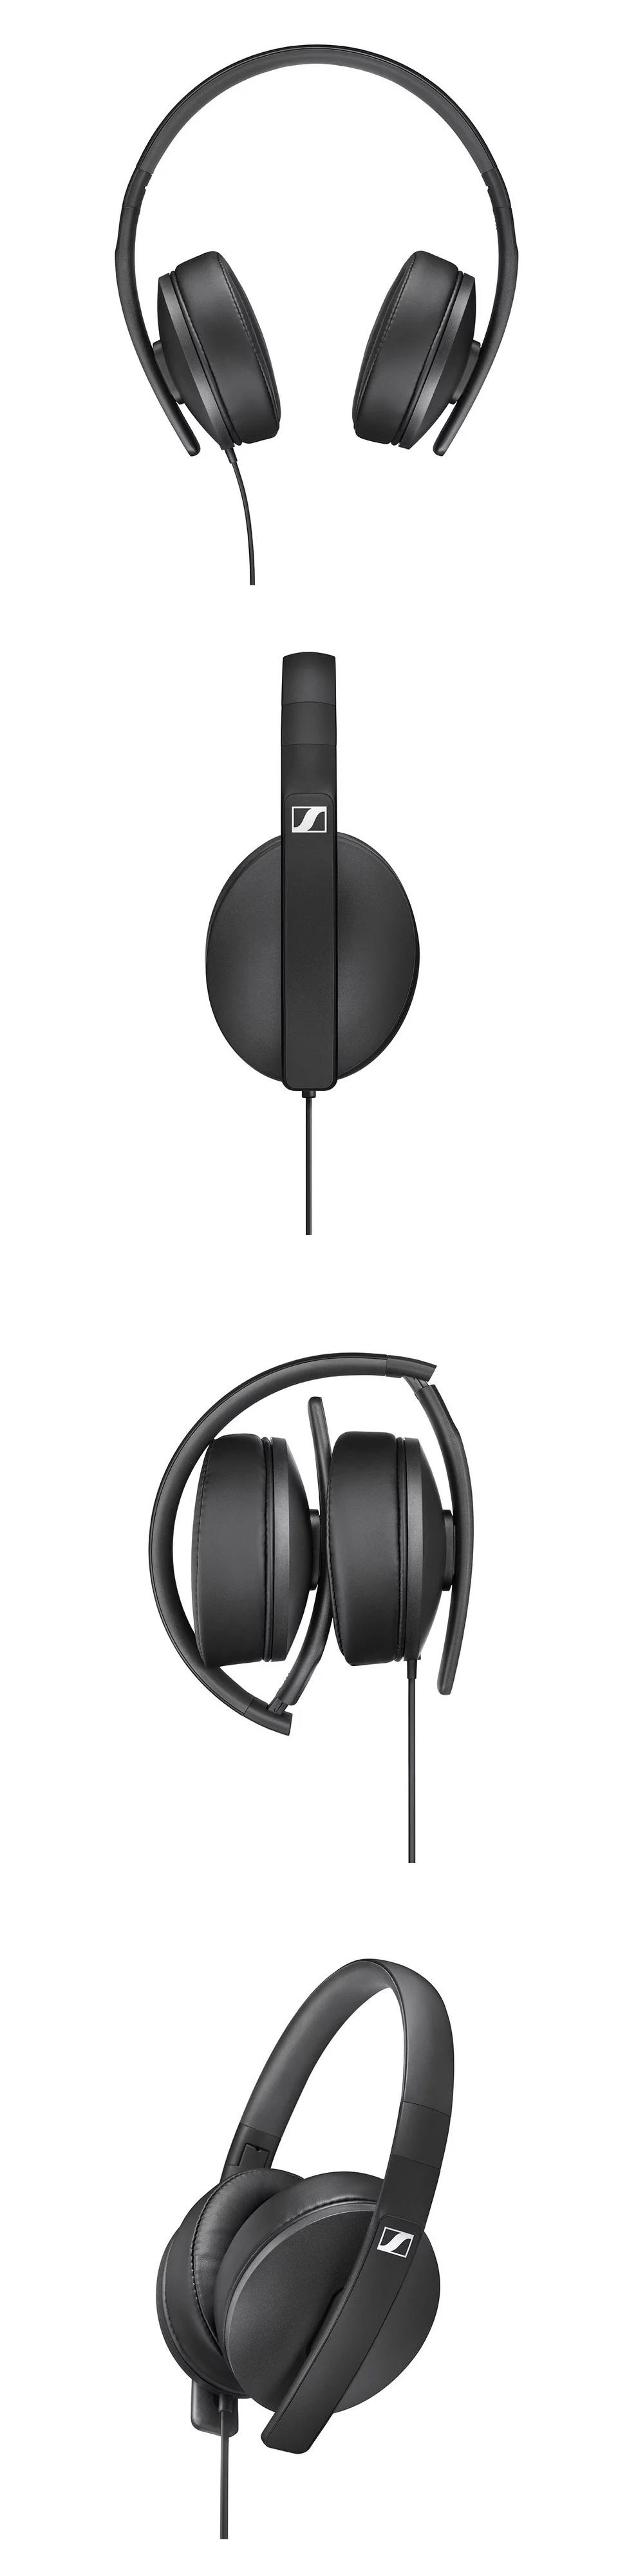 Sennheiser HD 300 Over Ear Headphones feature product